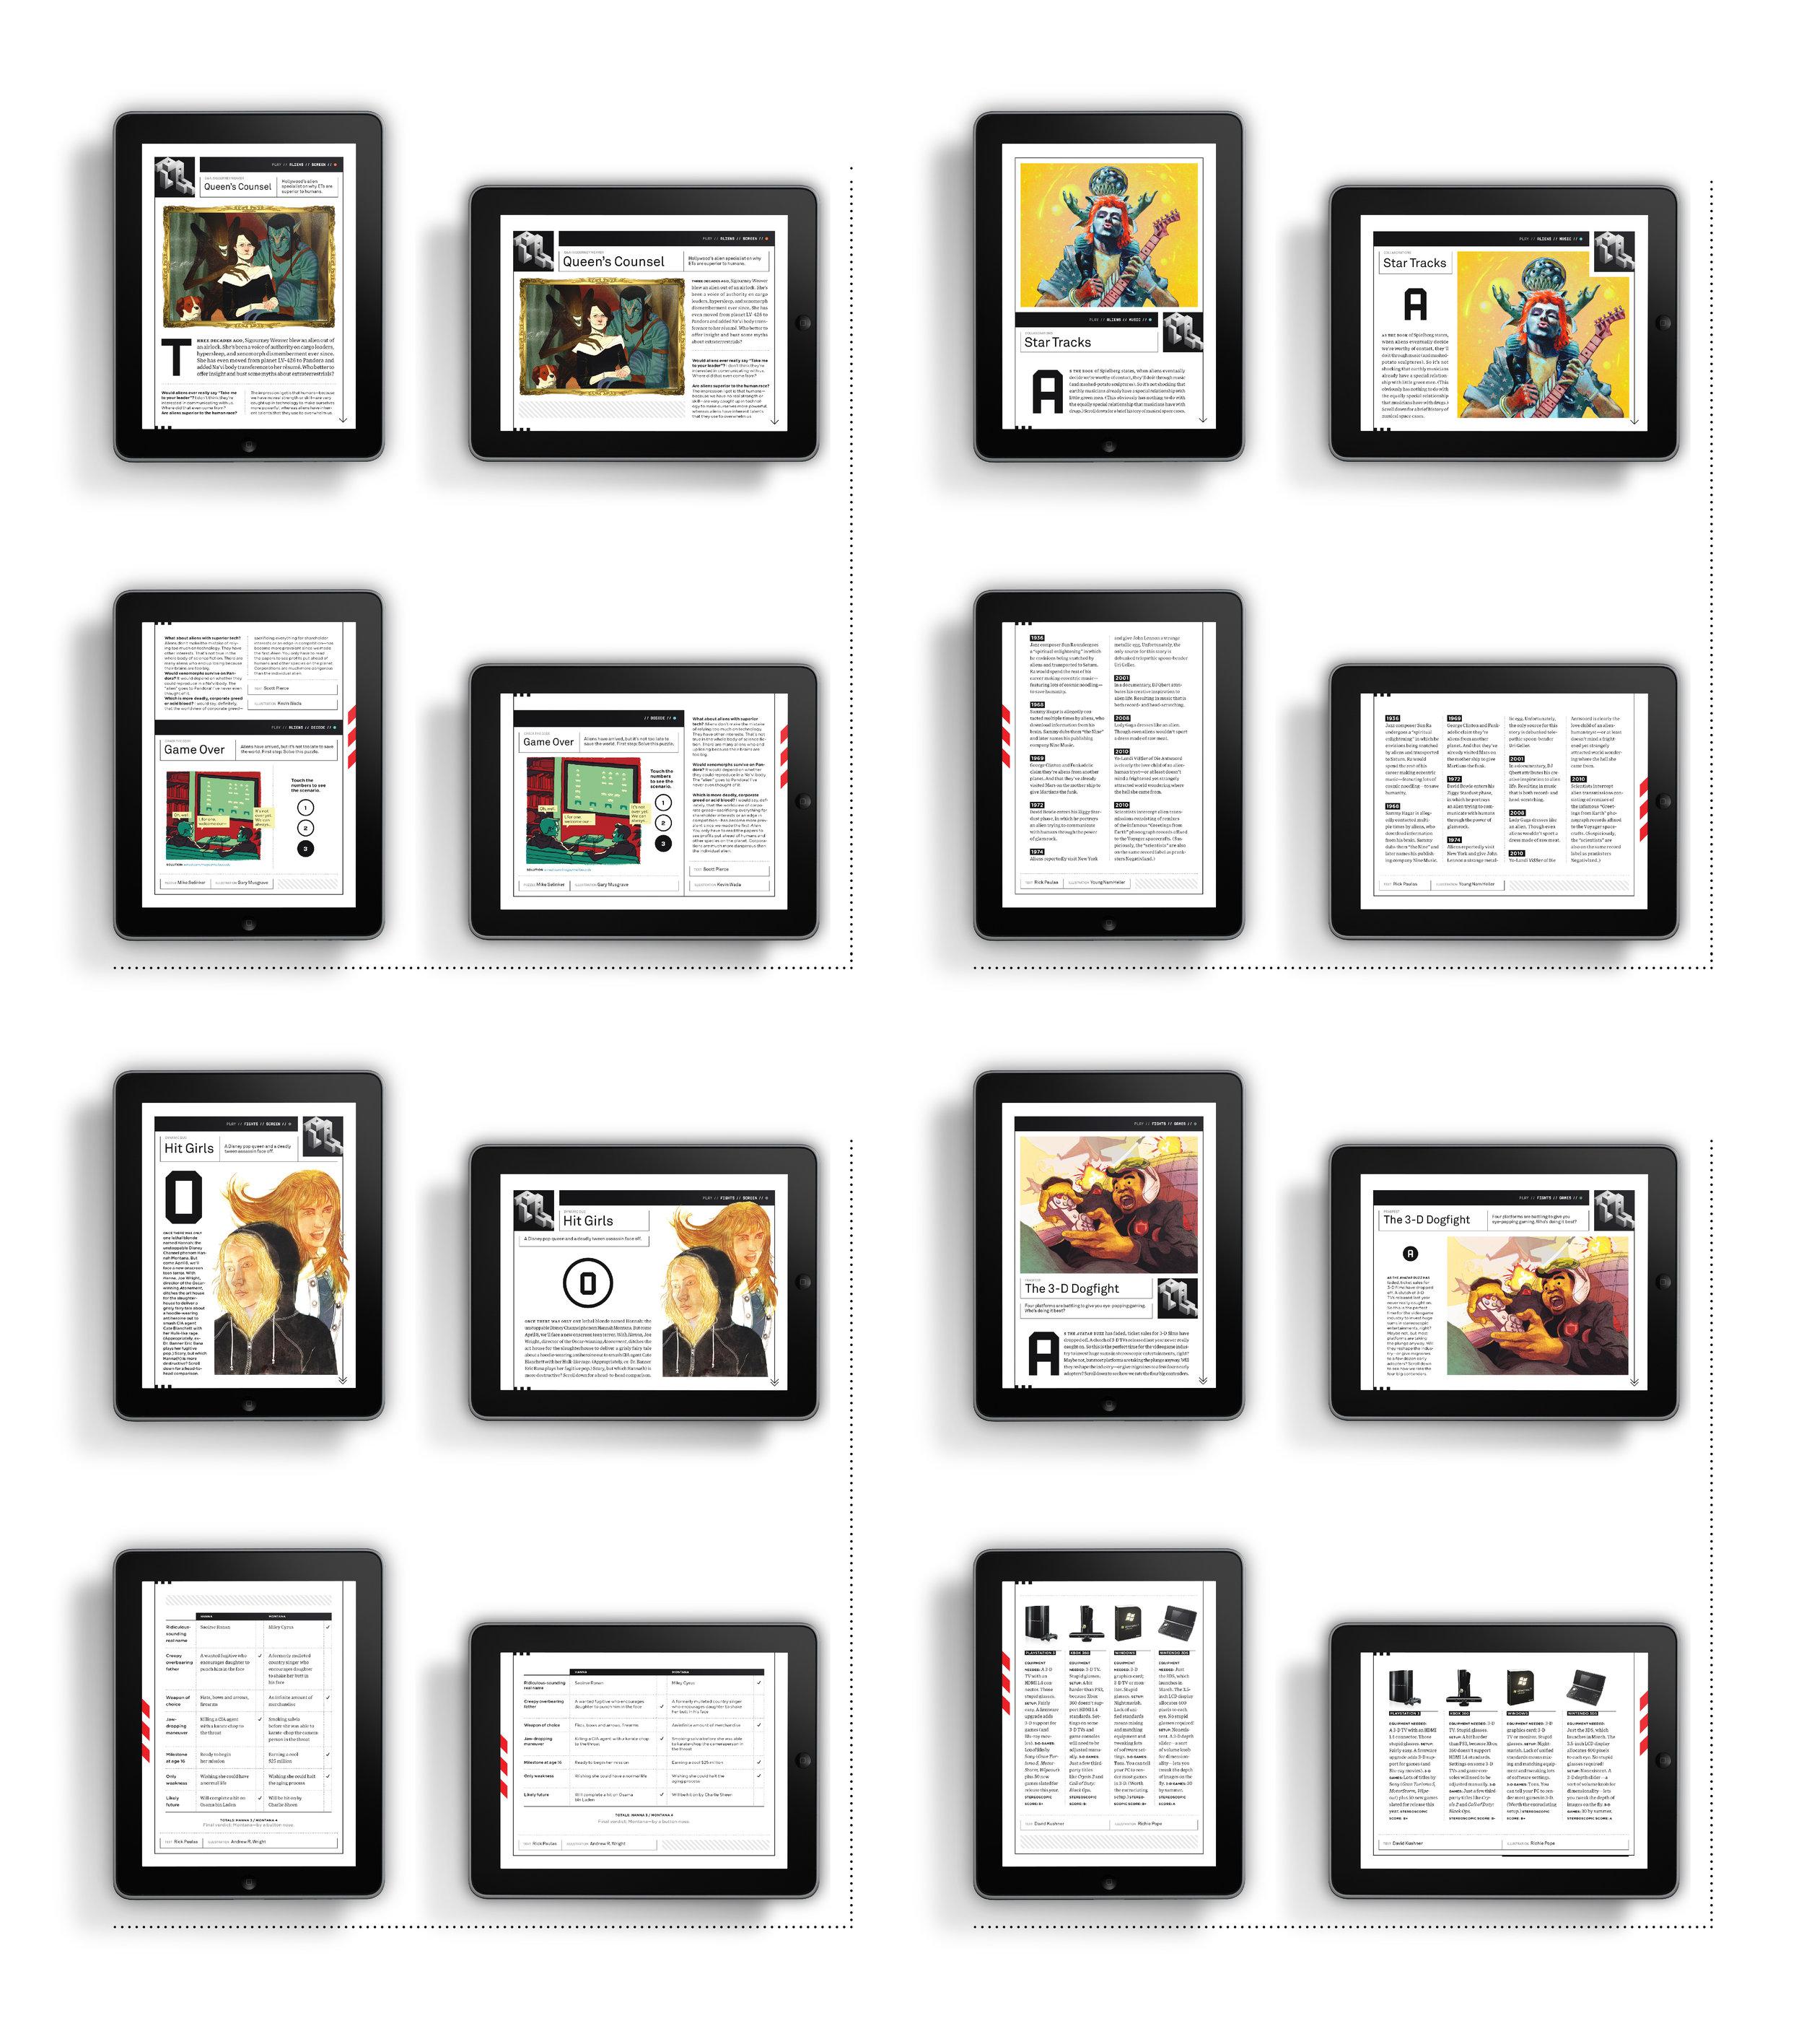 Penny_Lorber_WIRED_iPad_06.jpg